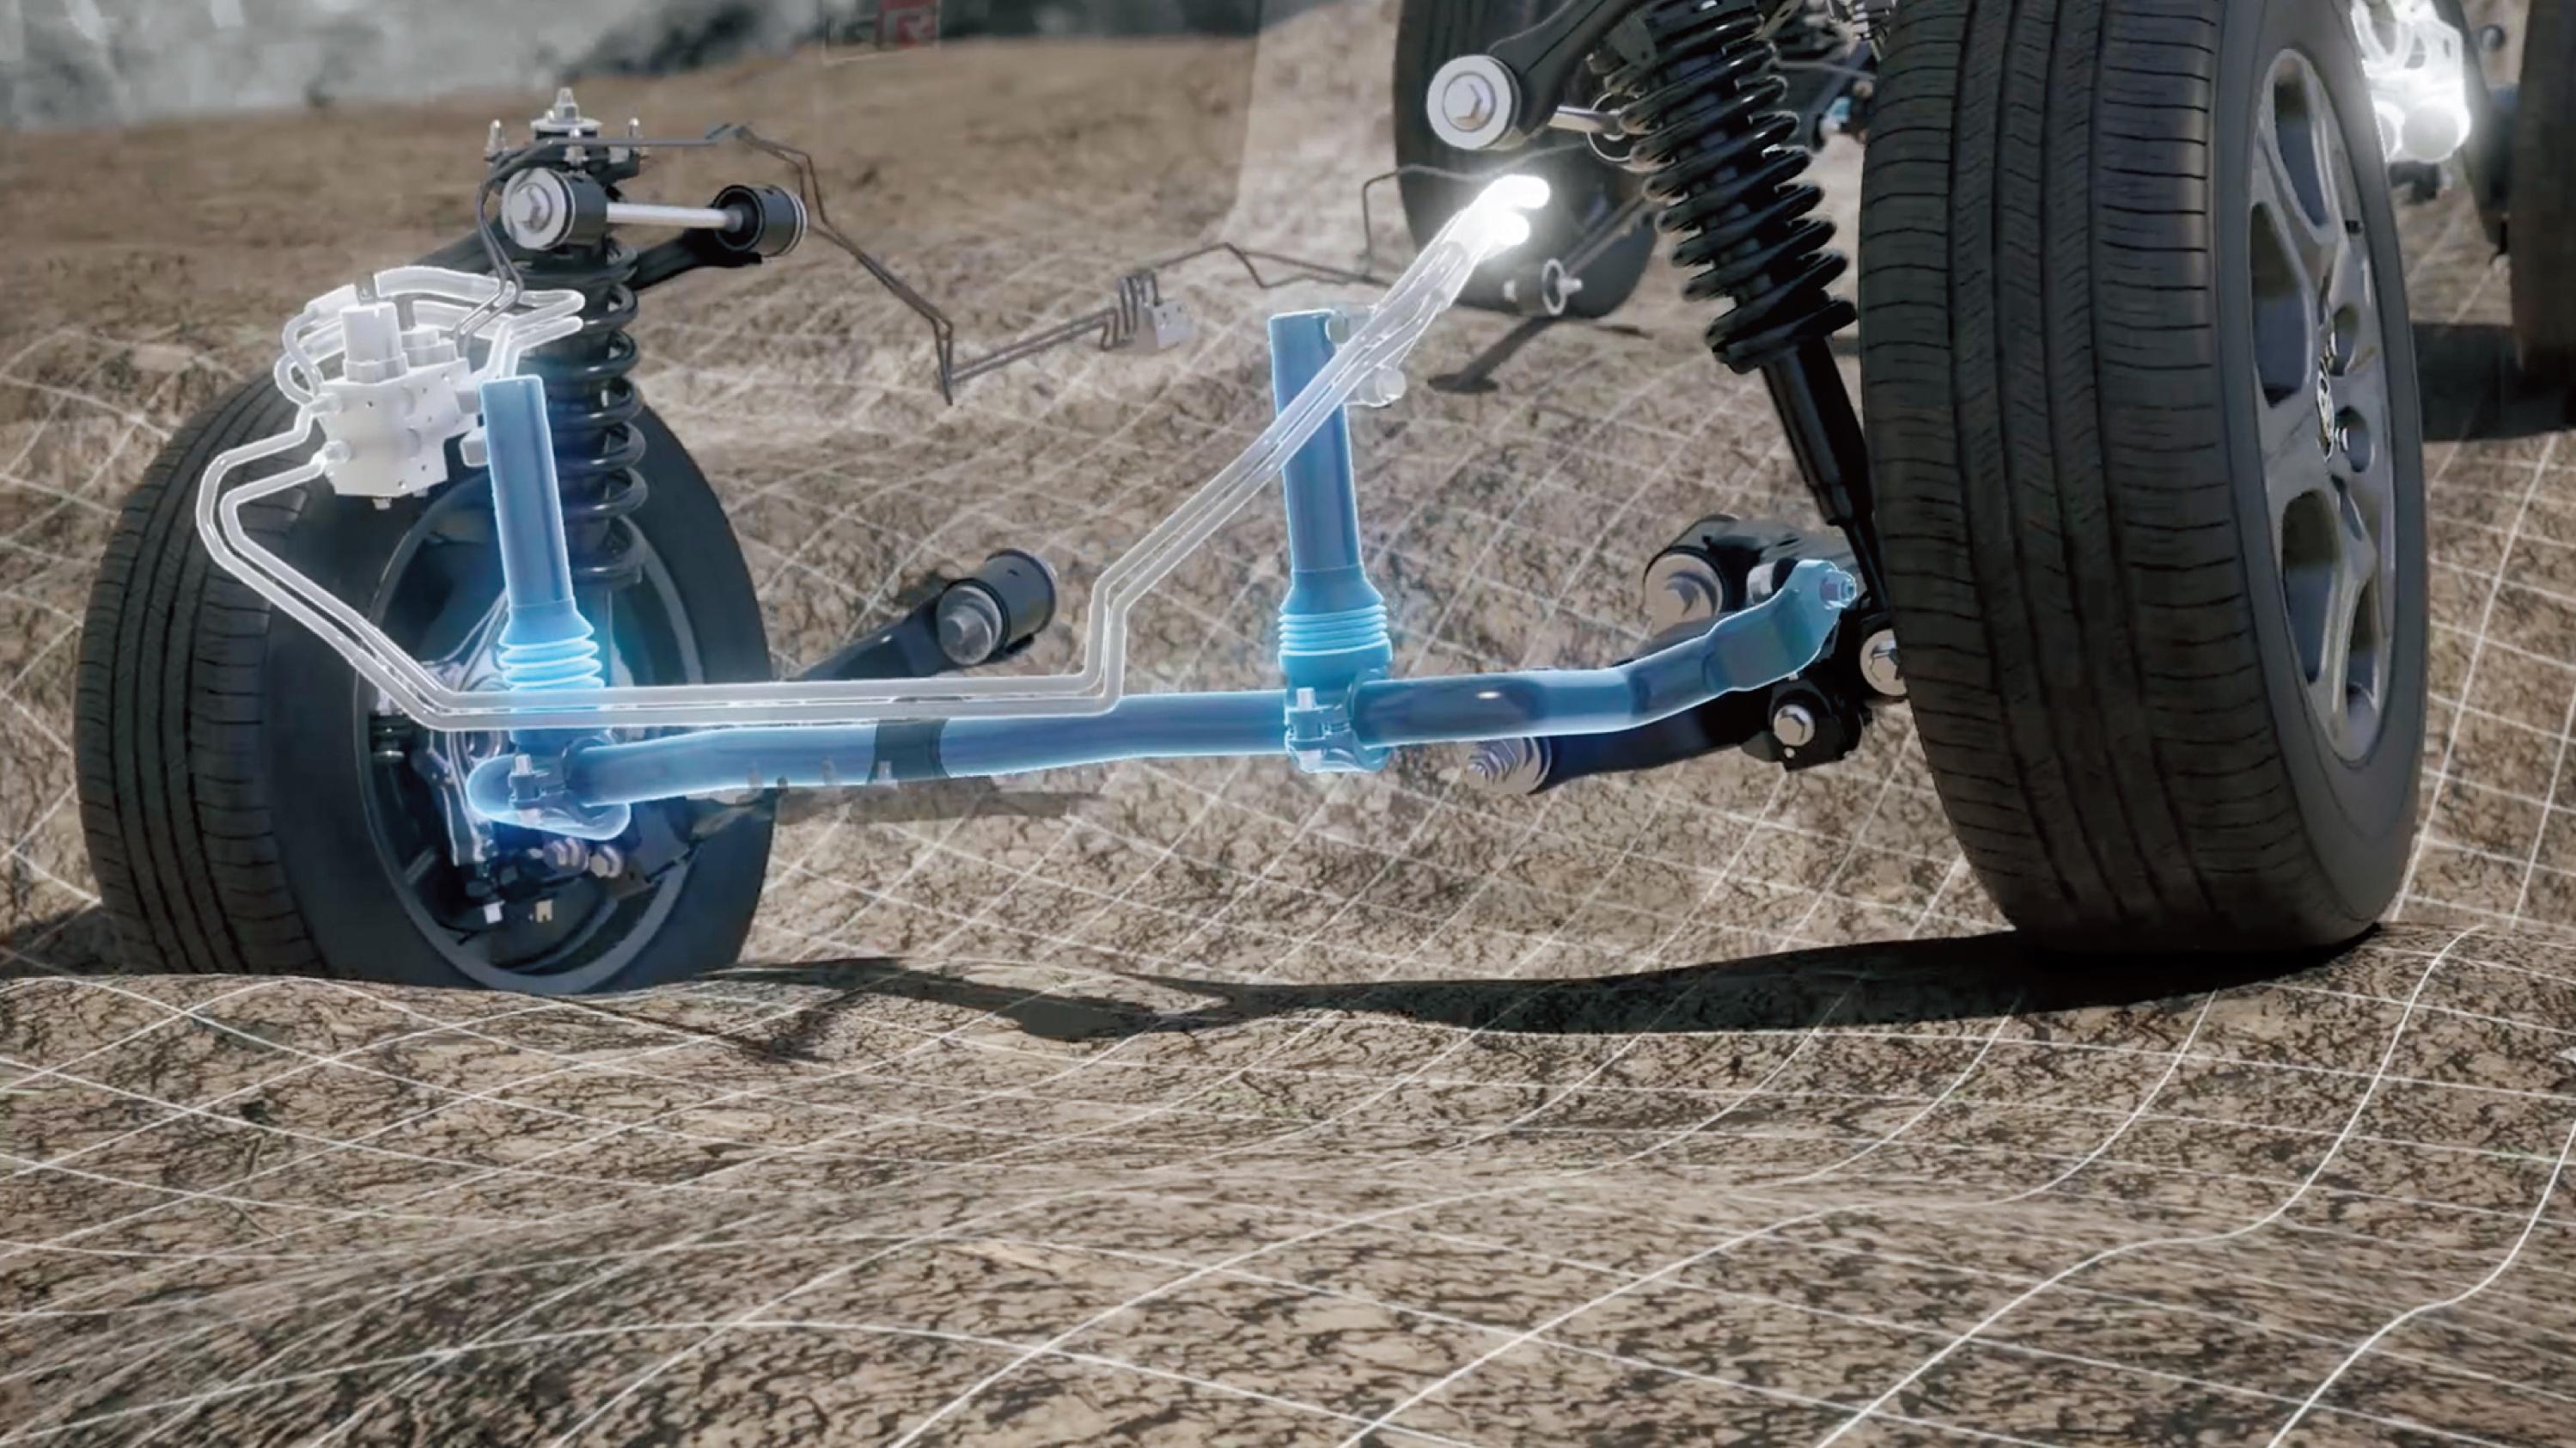 Toyota LandCruiser 300 series suspension